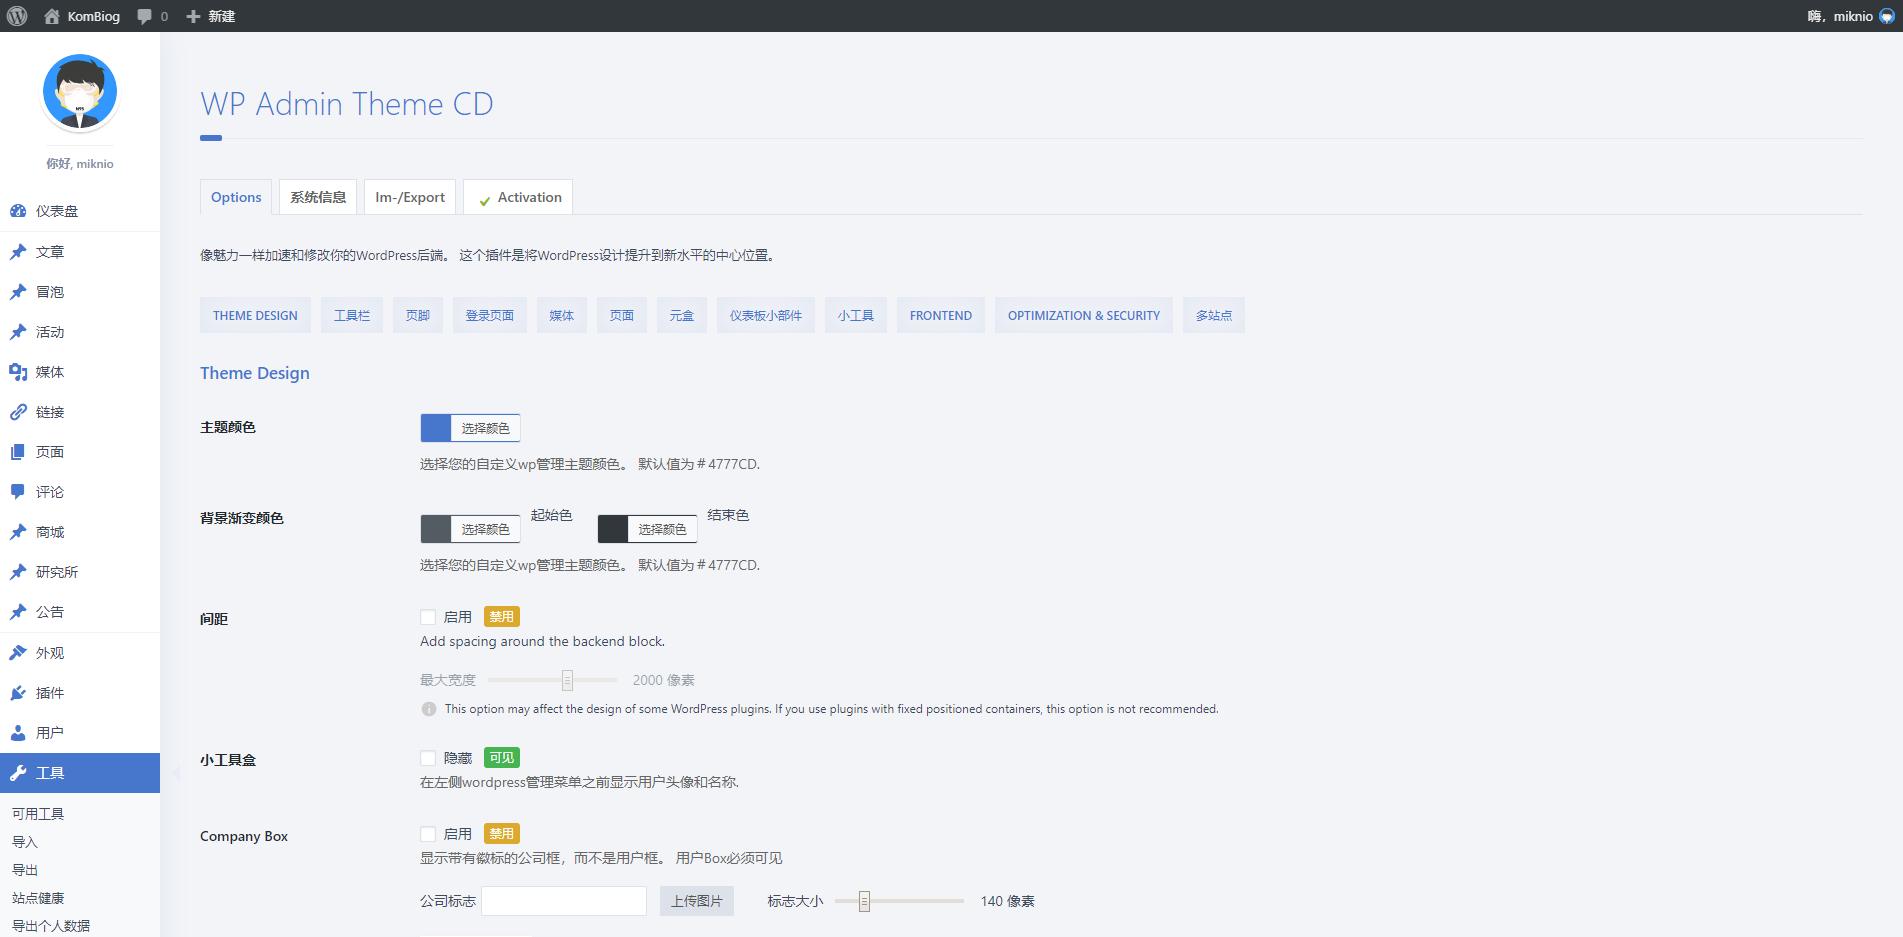 WordPress插件Wphave Admin一款漂亮的后台管理主题v1.9汉化版-常网小站Miknio